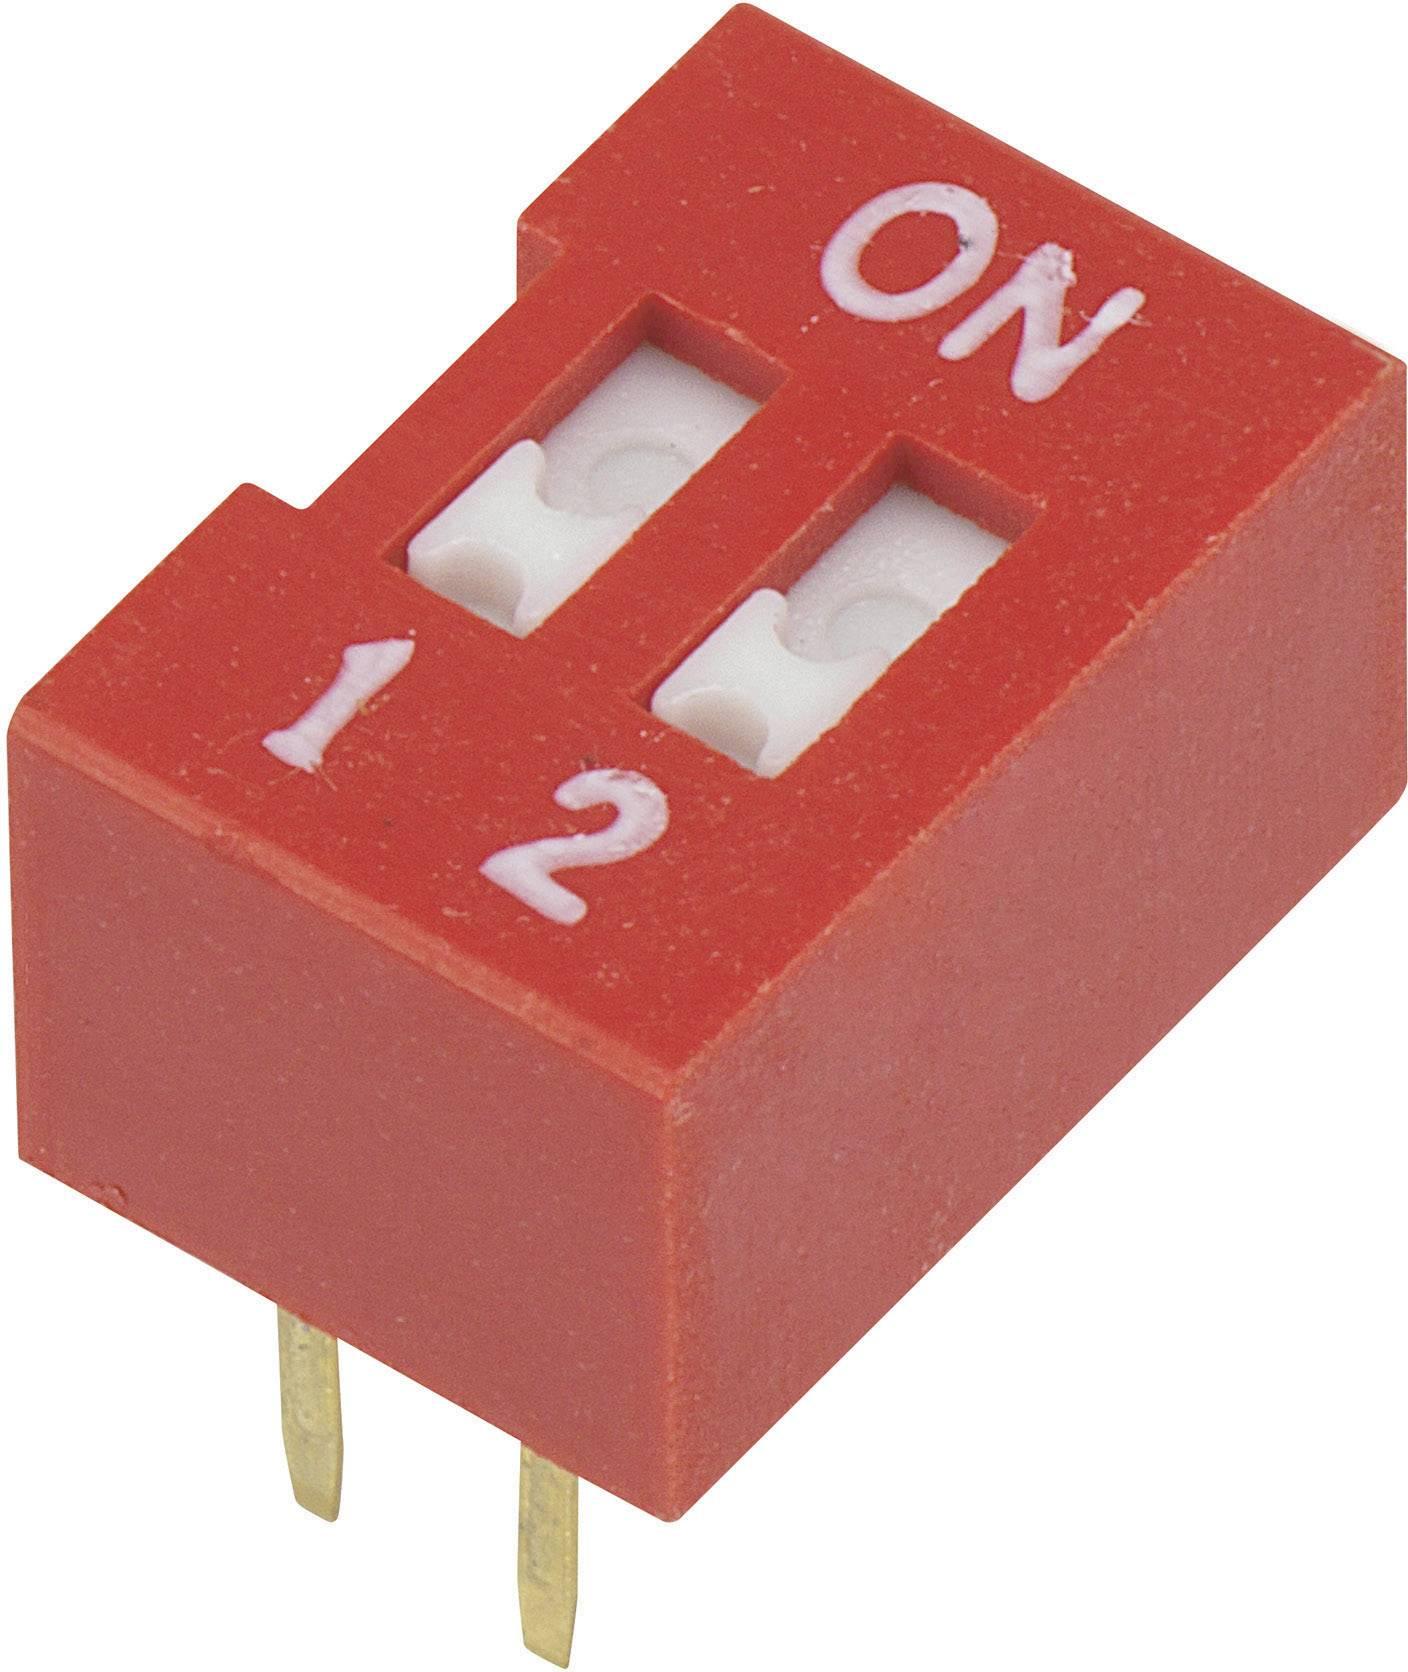 DIP spínač DSR-02, (š x v) 9,9 mm x 5,7 mm